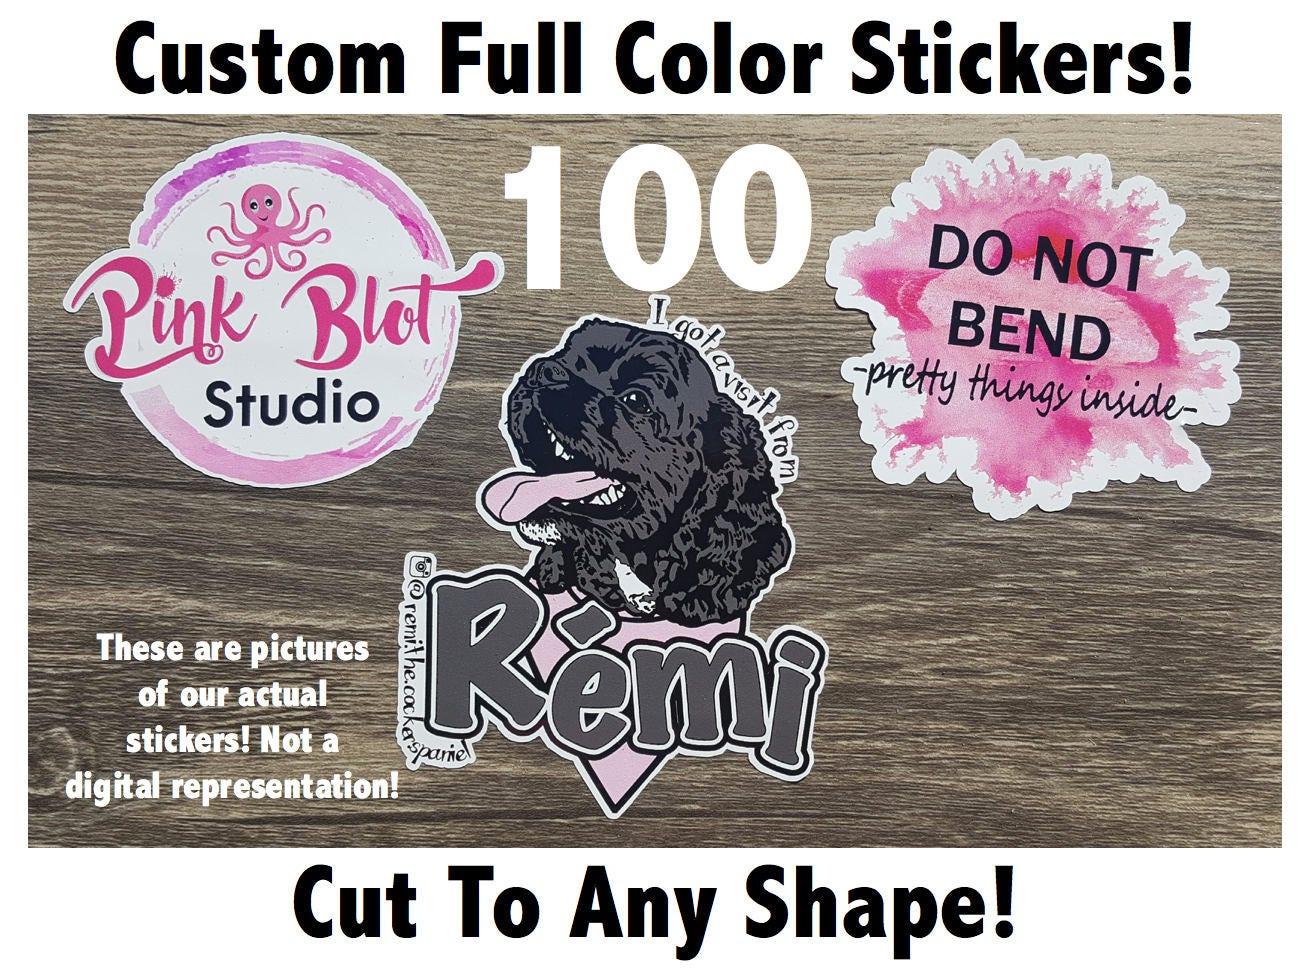 Custom Cut Vinyl Stickers Promotional Stickers Choose - Custom vinyl stickers for promotional purposes